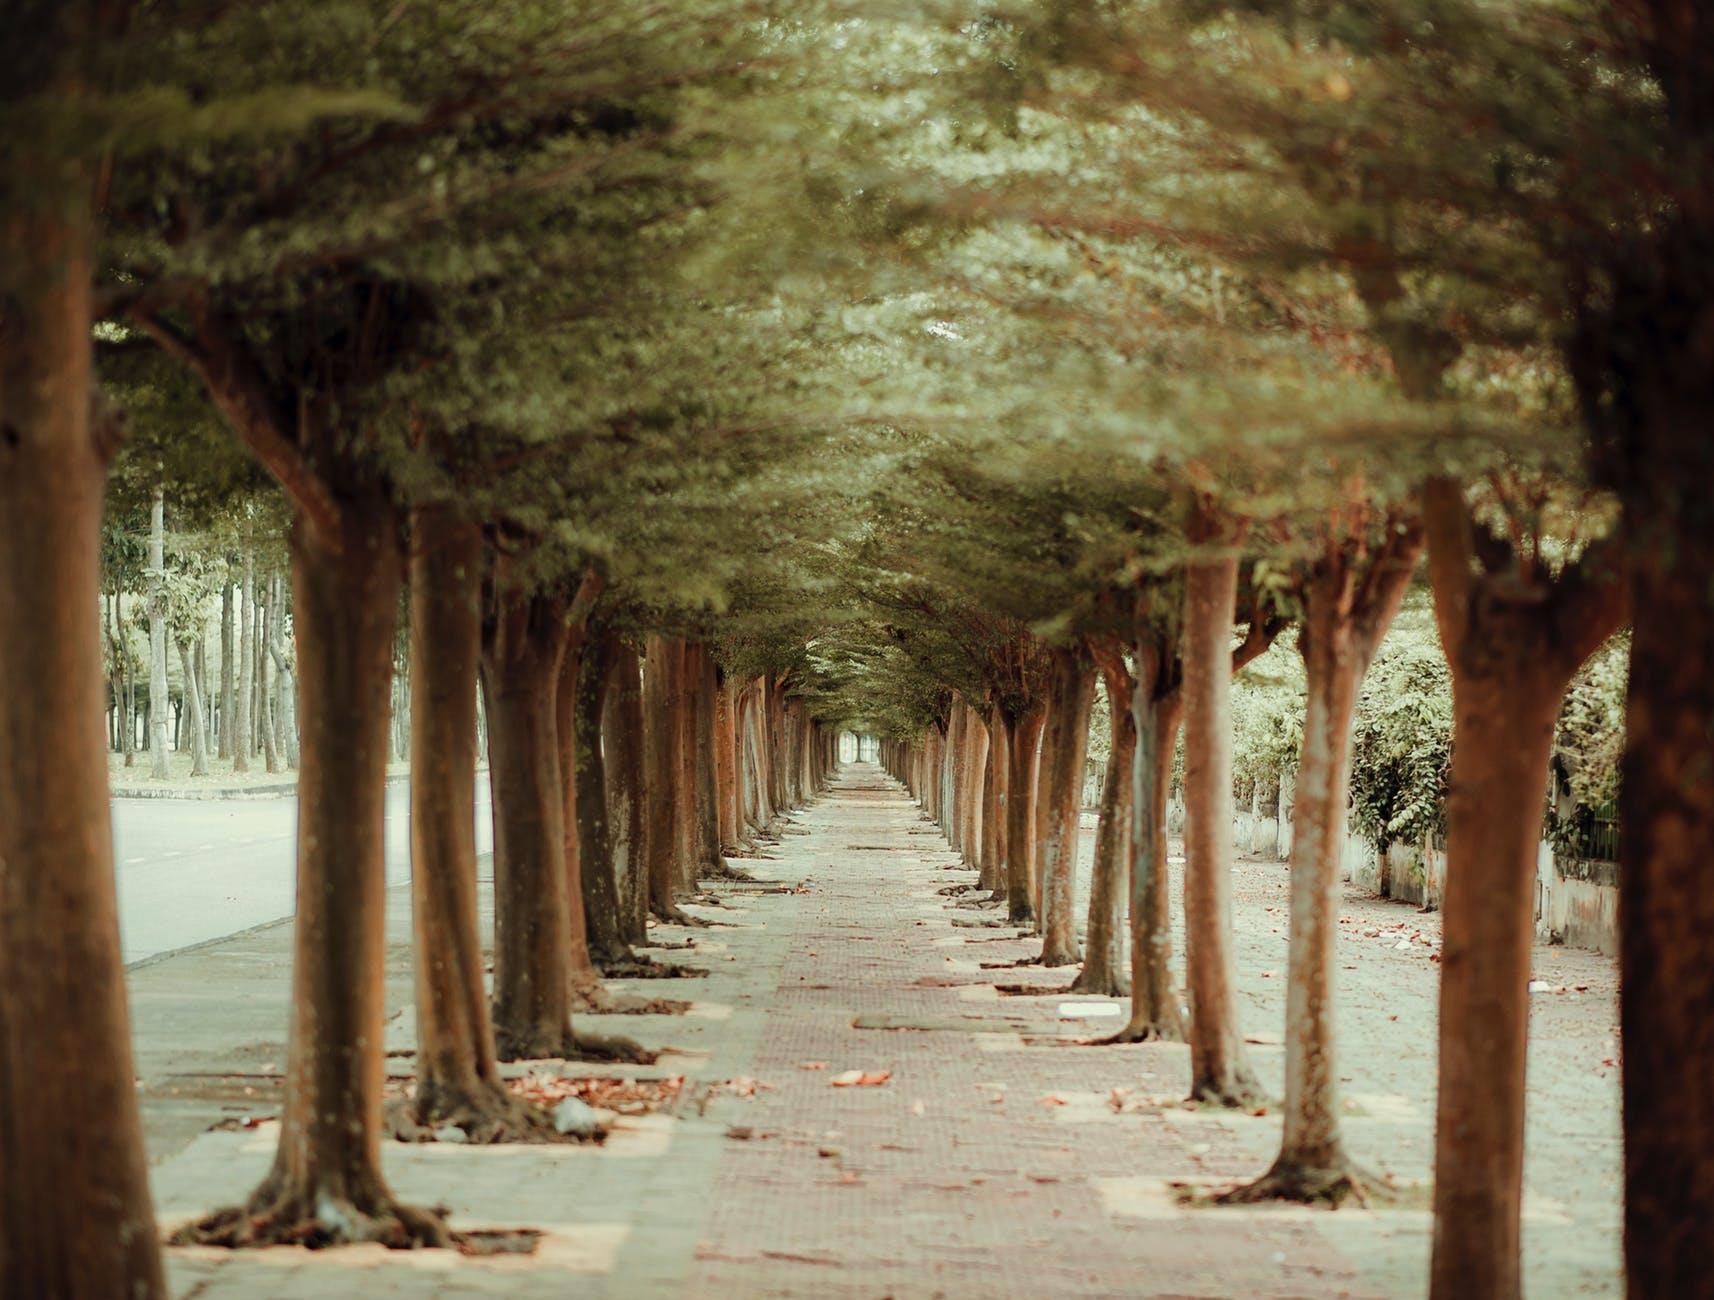 Photo of Pathway In Between Trees, Photo of Pathway In Between Trees